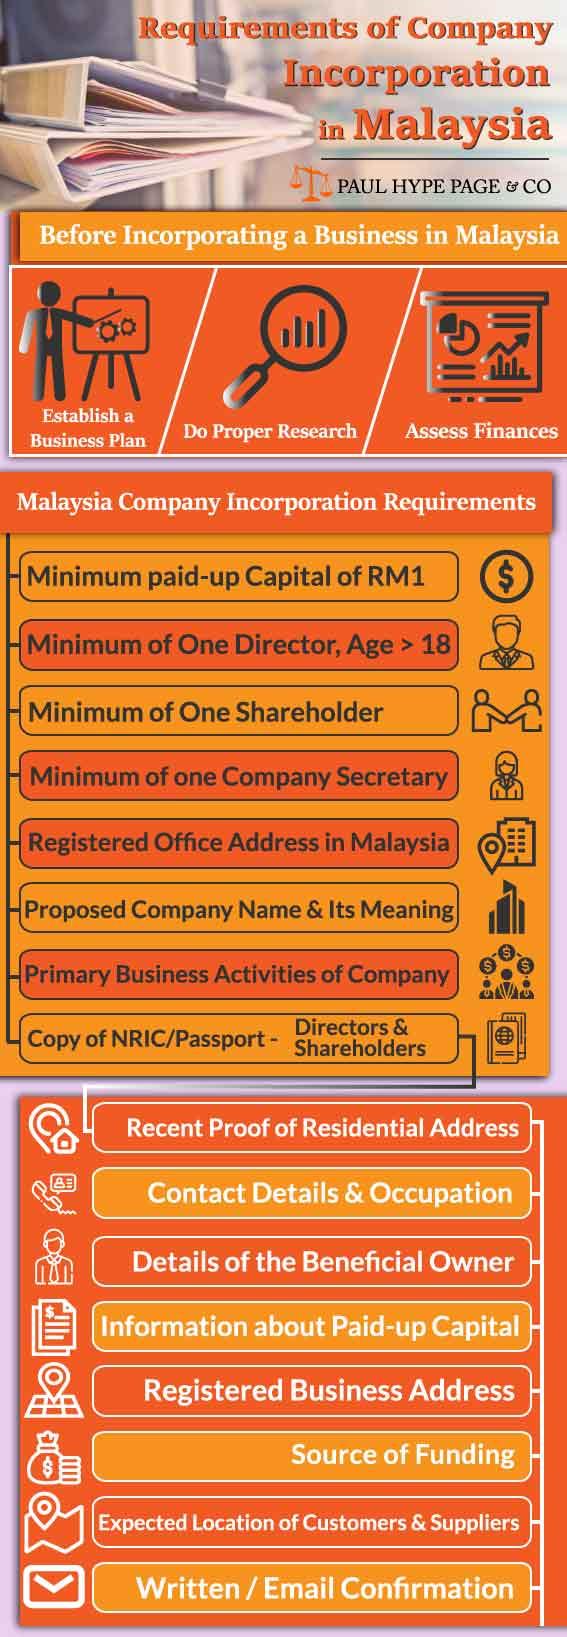 Malaysia Company Incorporation Requirements